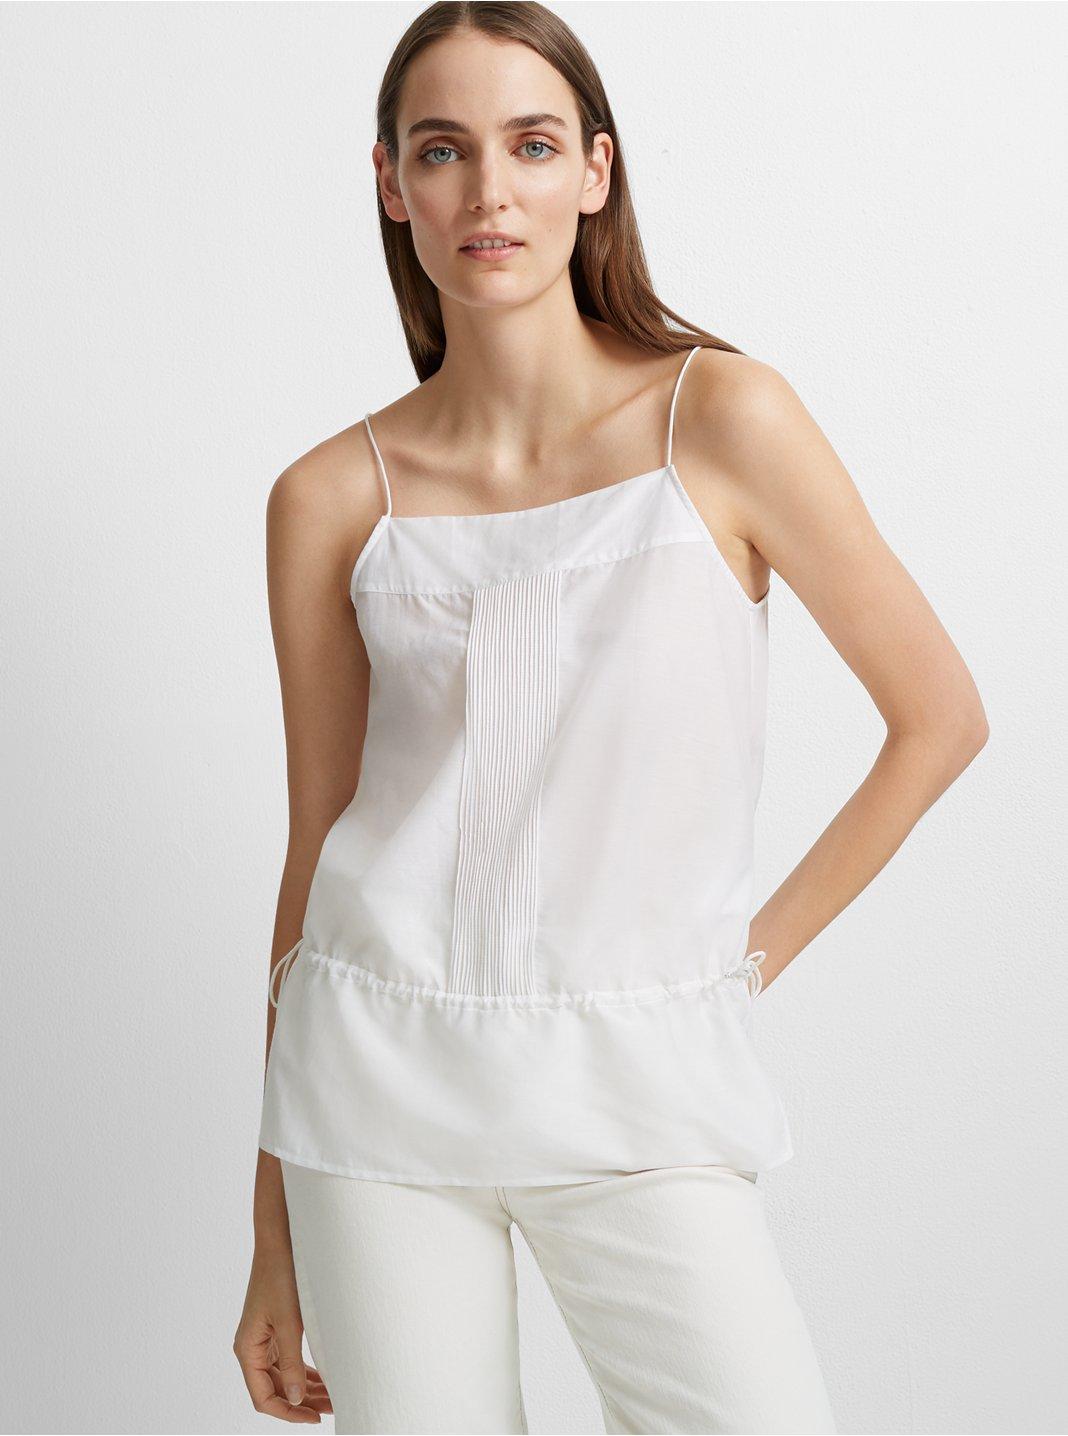 Prunestance Cotton-Silk Top